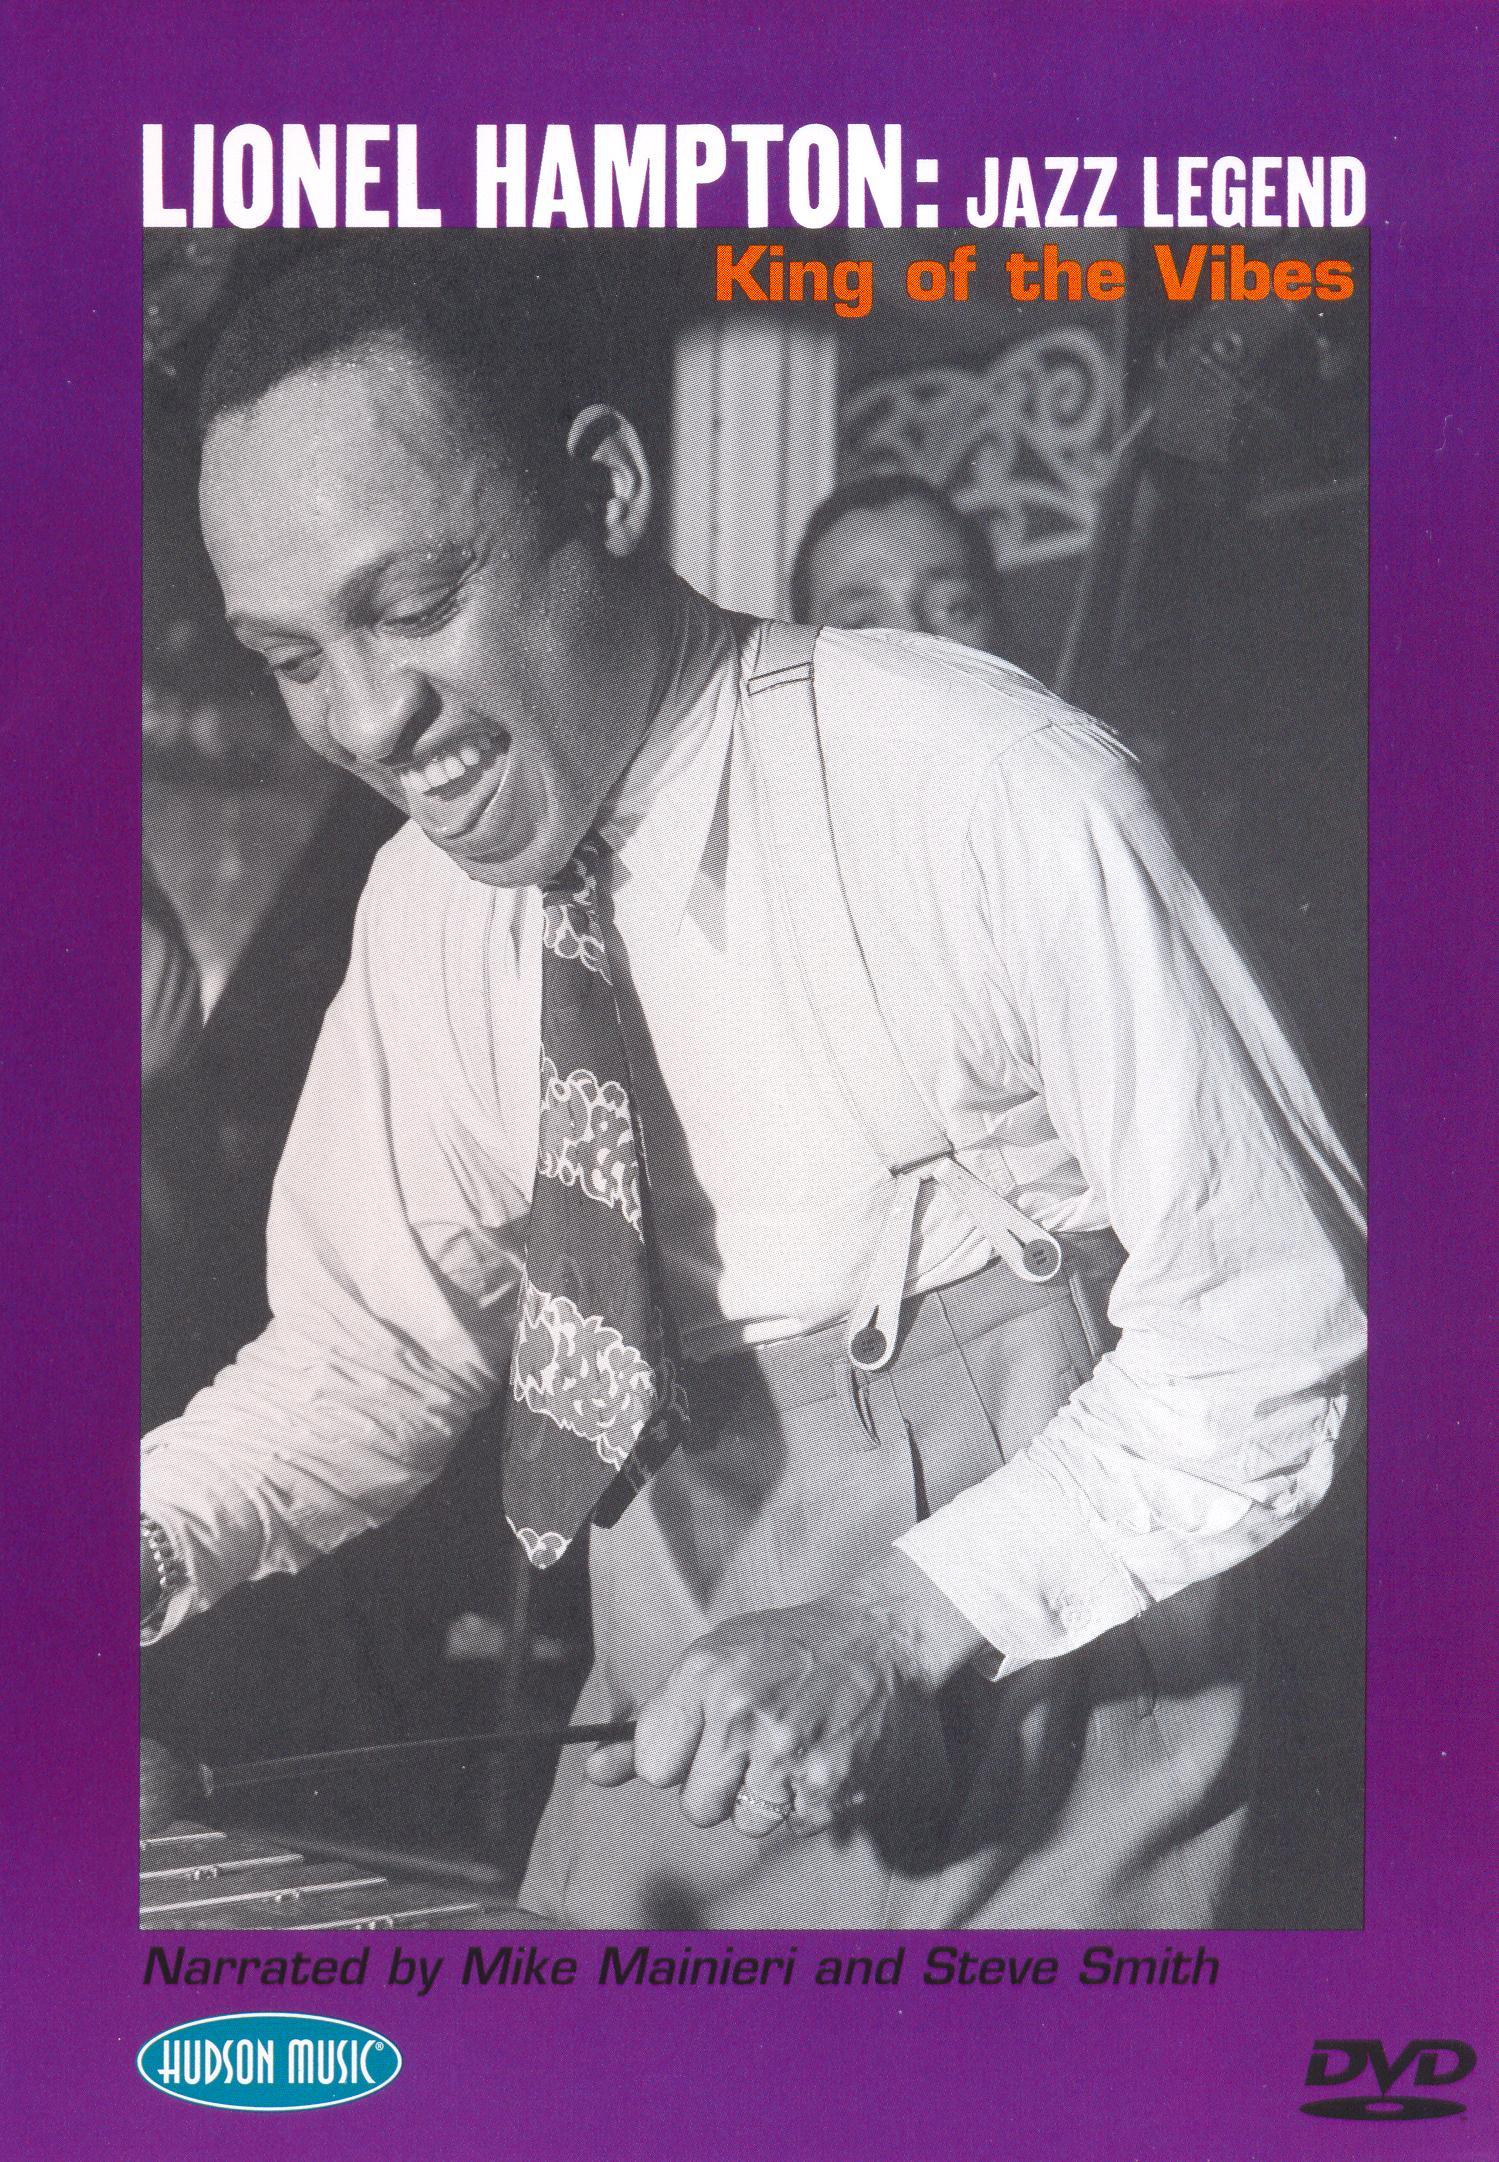 Lionel Hampton: Jazz Legend - King of the Vibes